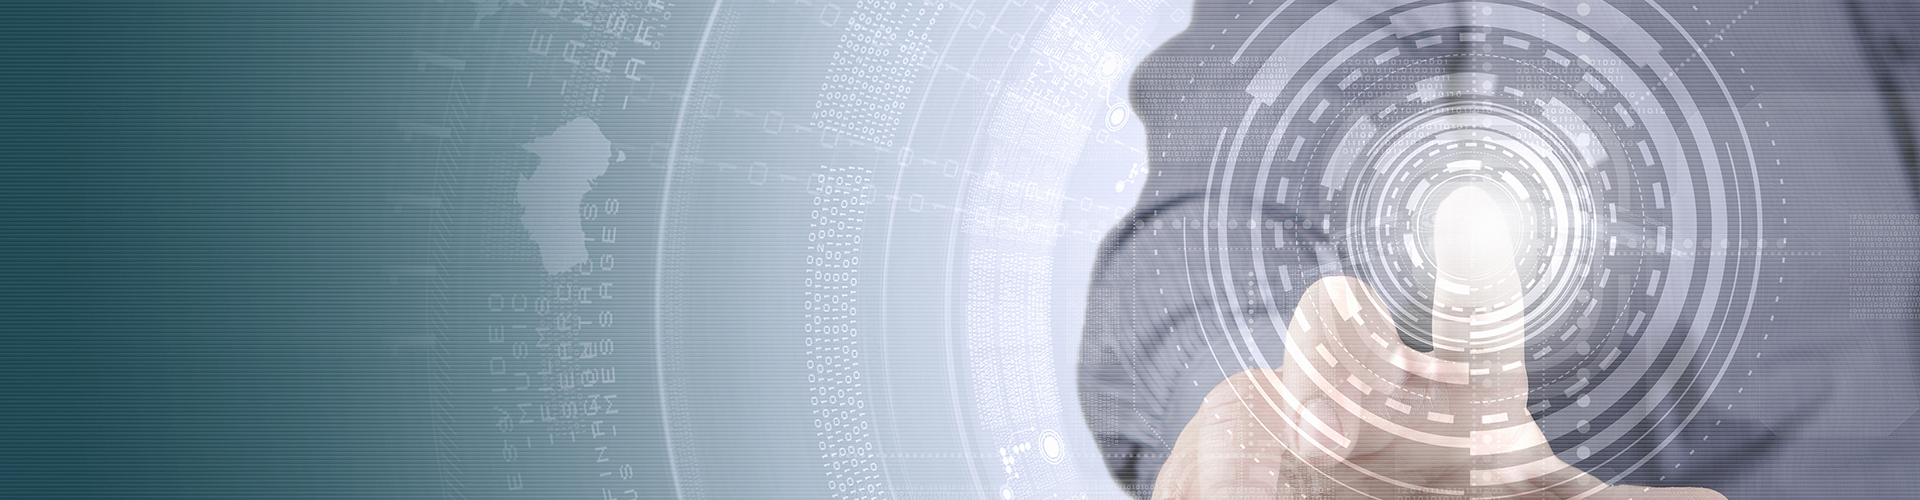 disruptive-technologies-set